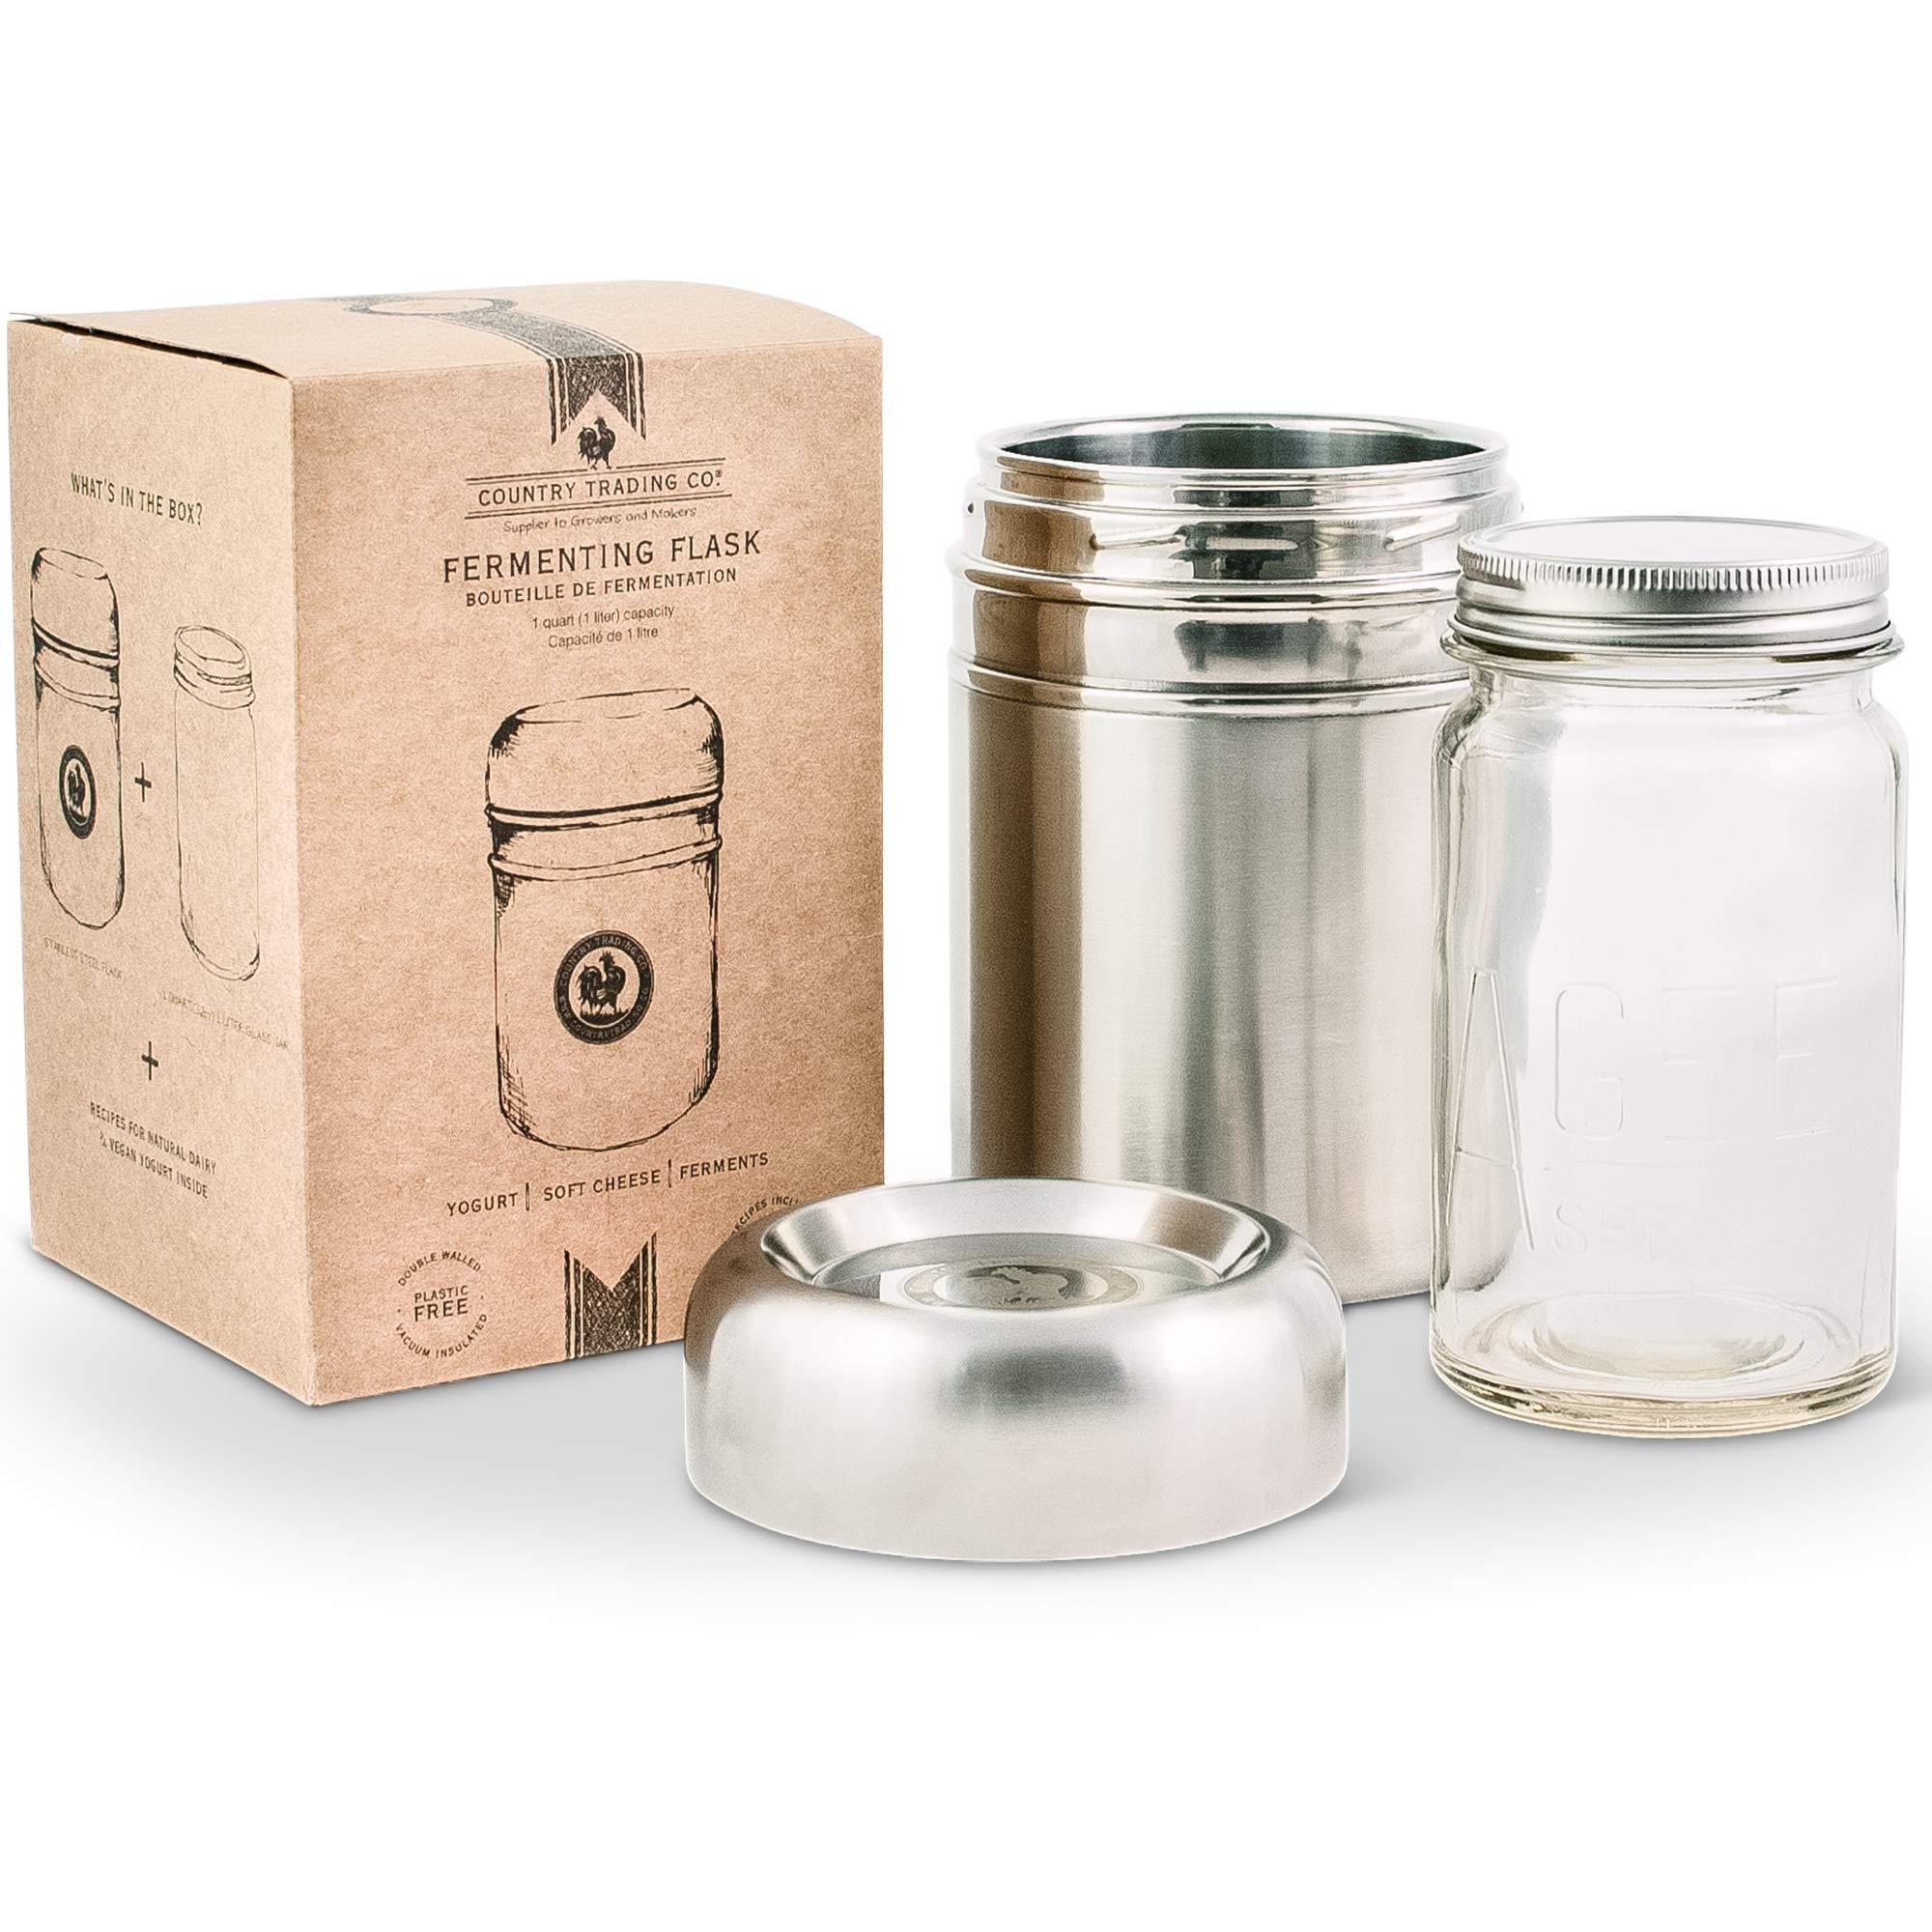 Stainless Steel Yogurt Maker with 1 Quart Glass Jar